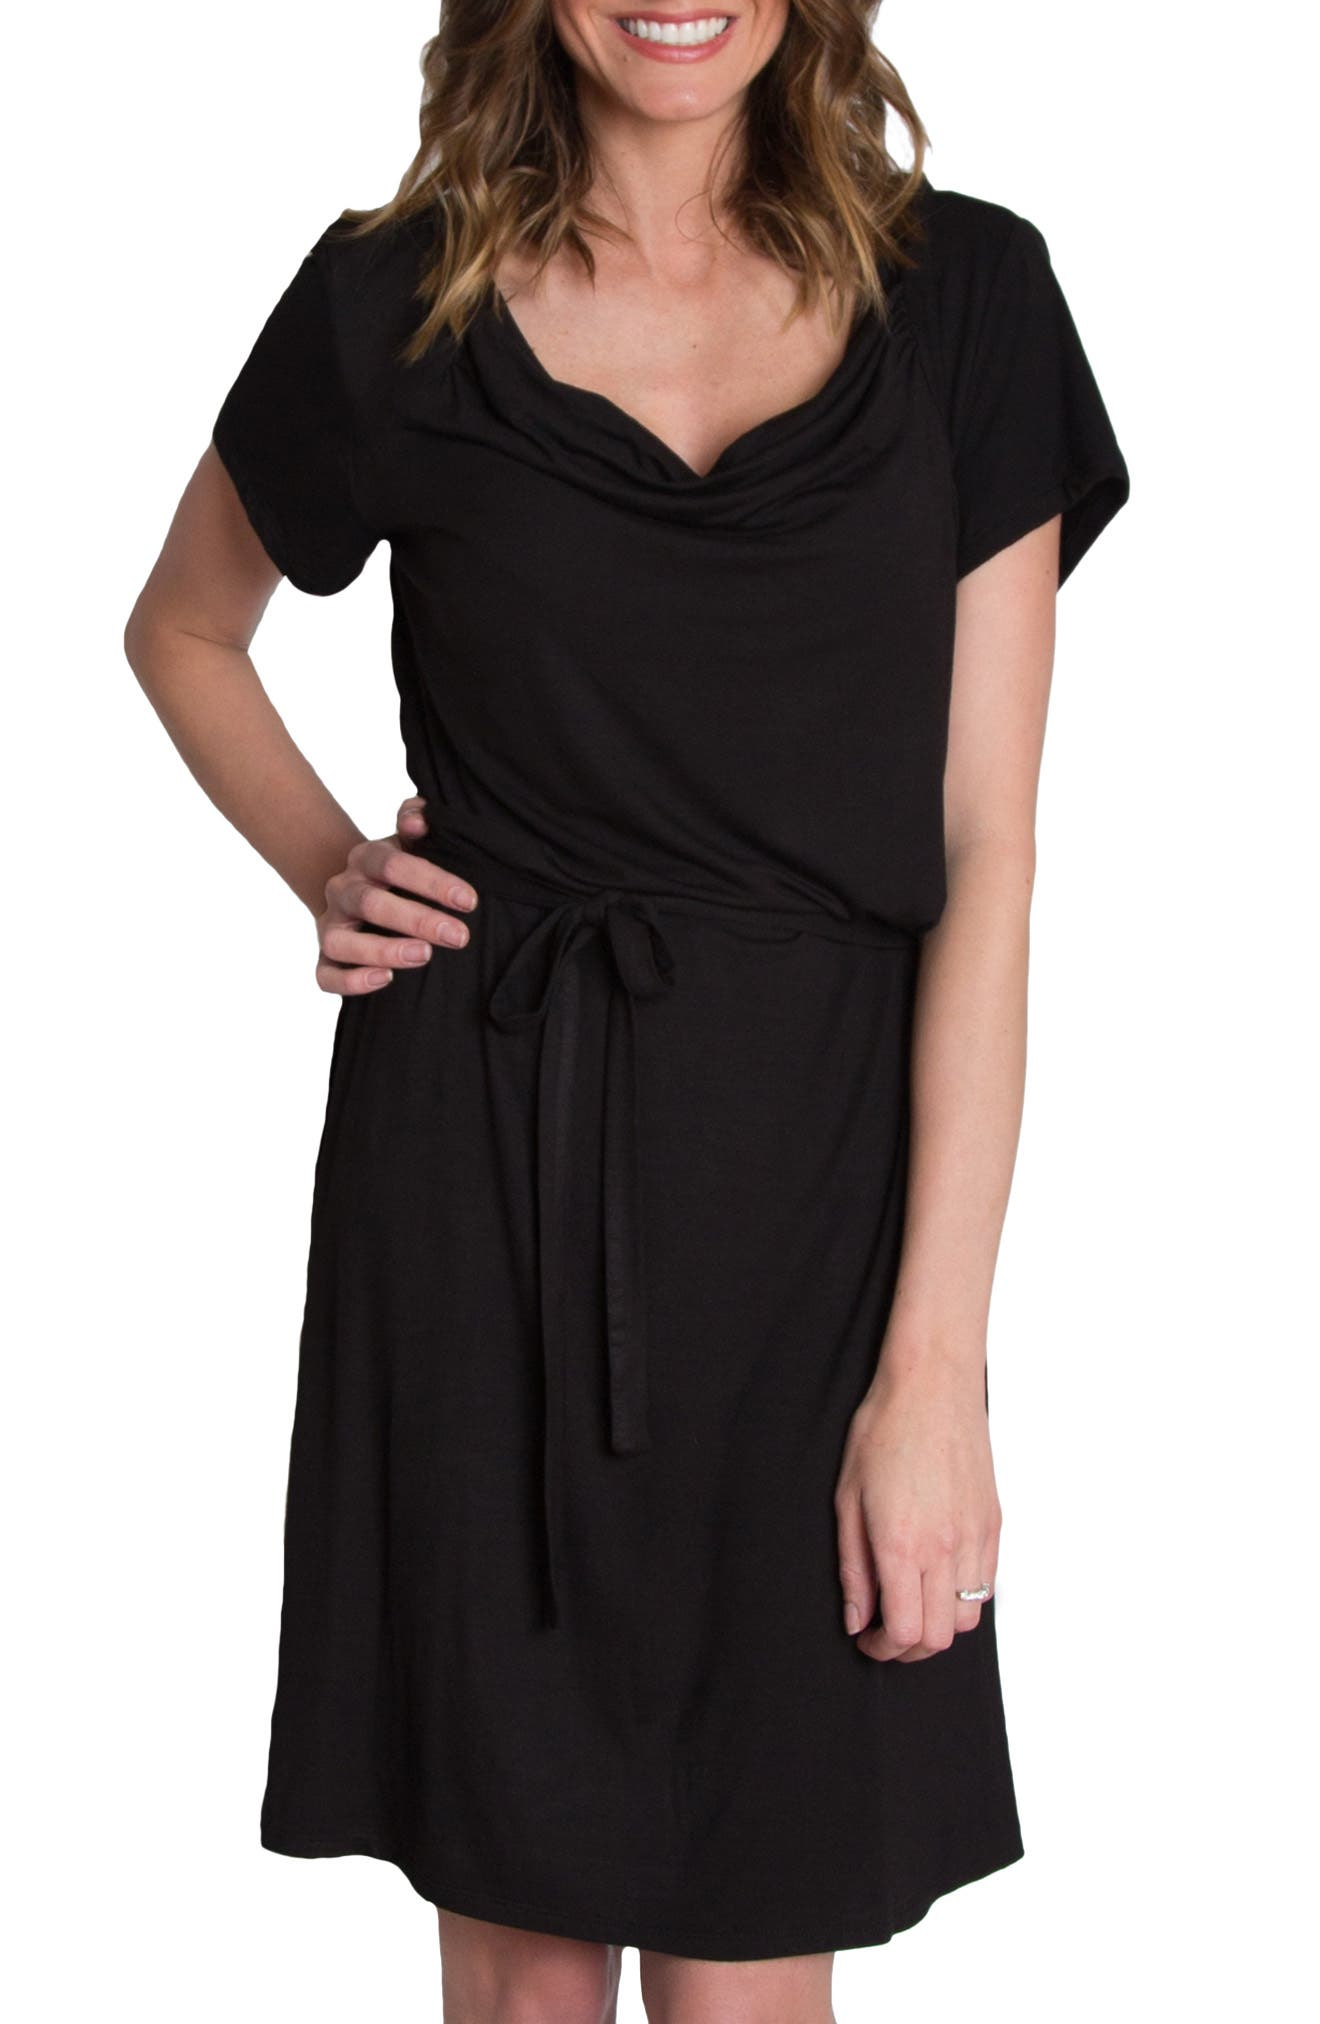 'Chic' Cowl Neck Nursing Dress,                             Alternate thumbnail 2, color,                             BLACK